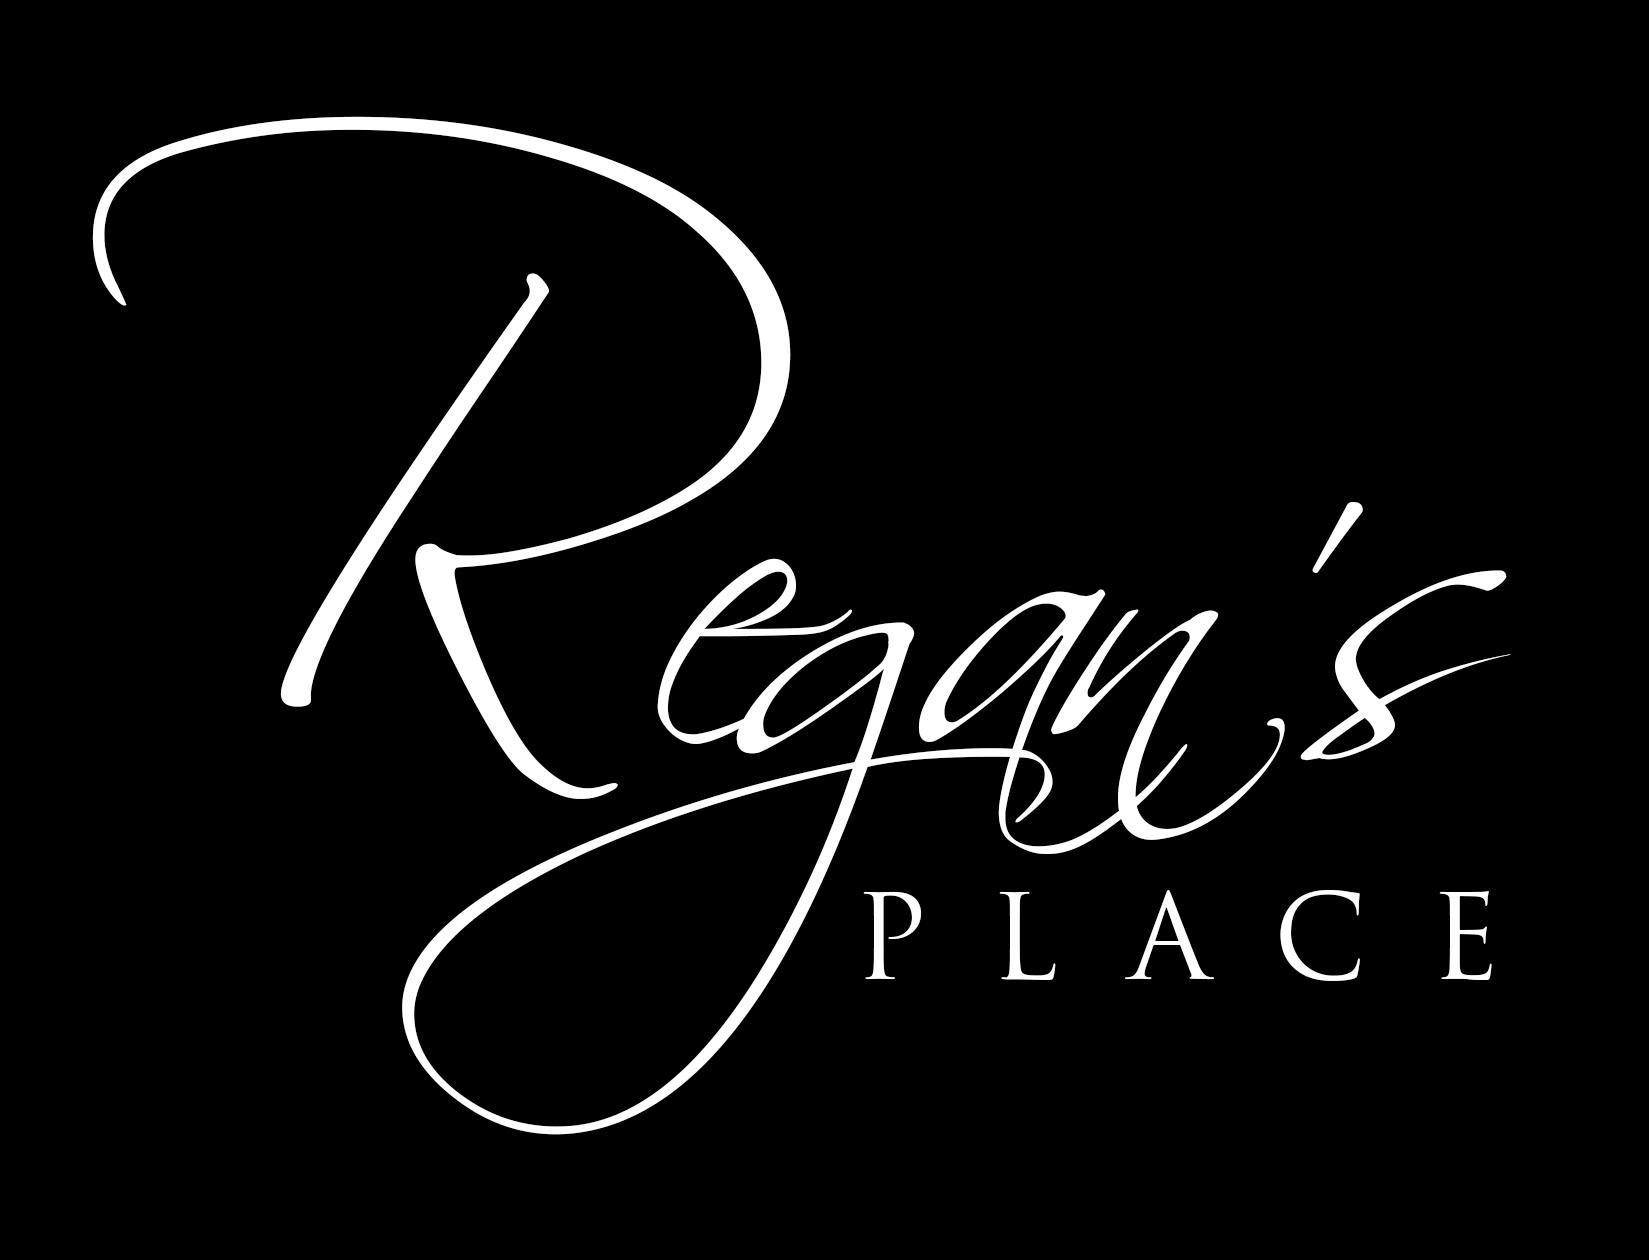 Regan's Place _ LOGO 2.jpg